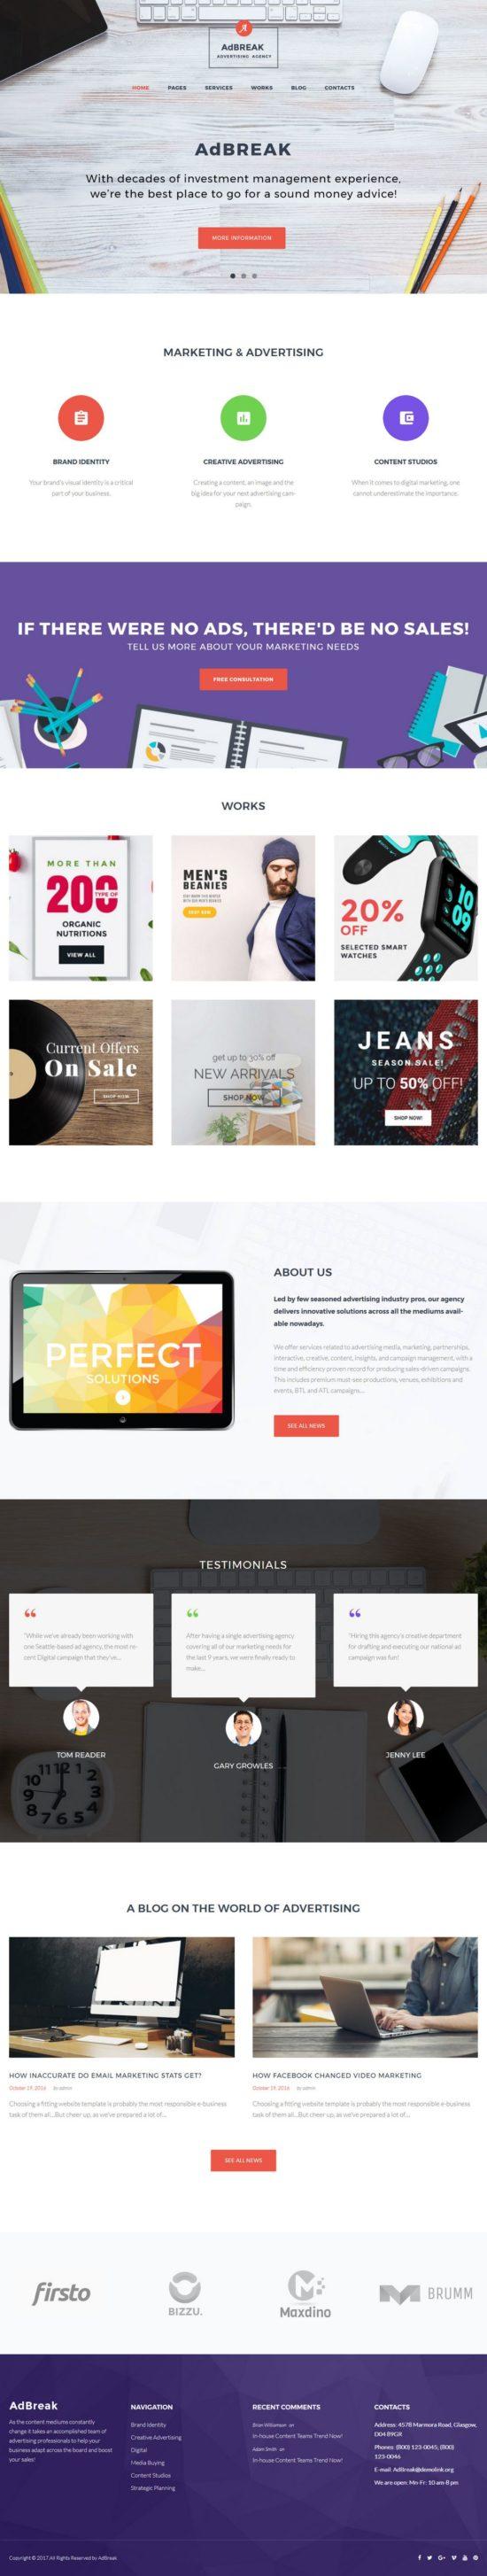 adbreak template monster wordpress theme 01 550x2908 - AdBreak WordPress Theme